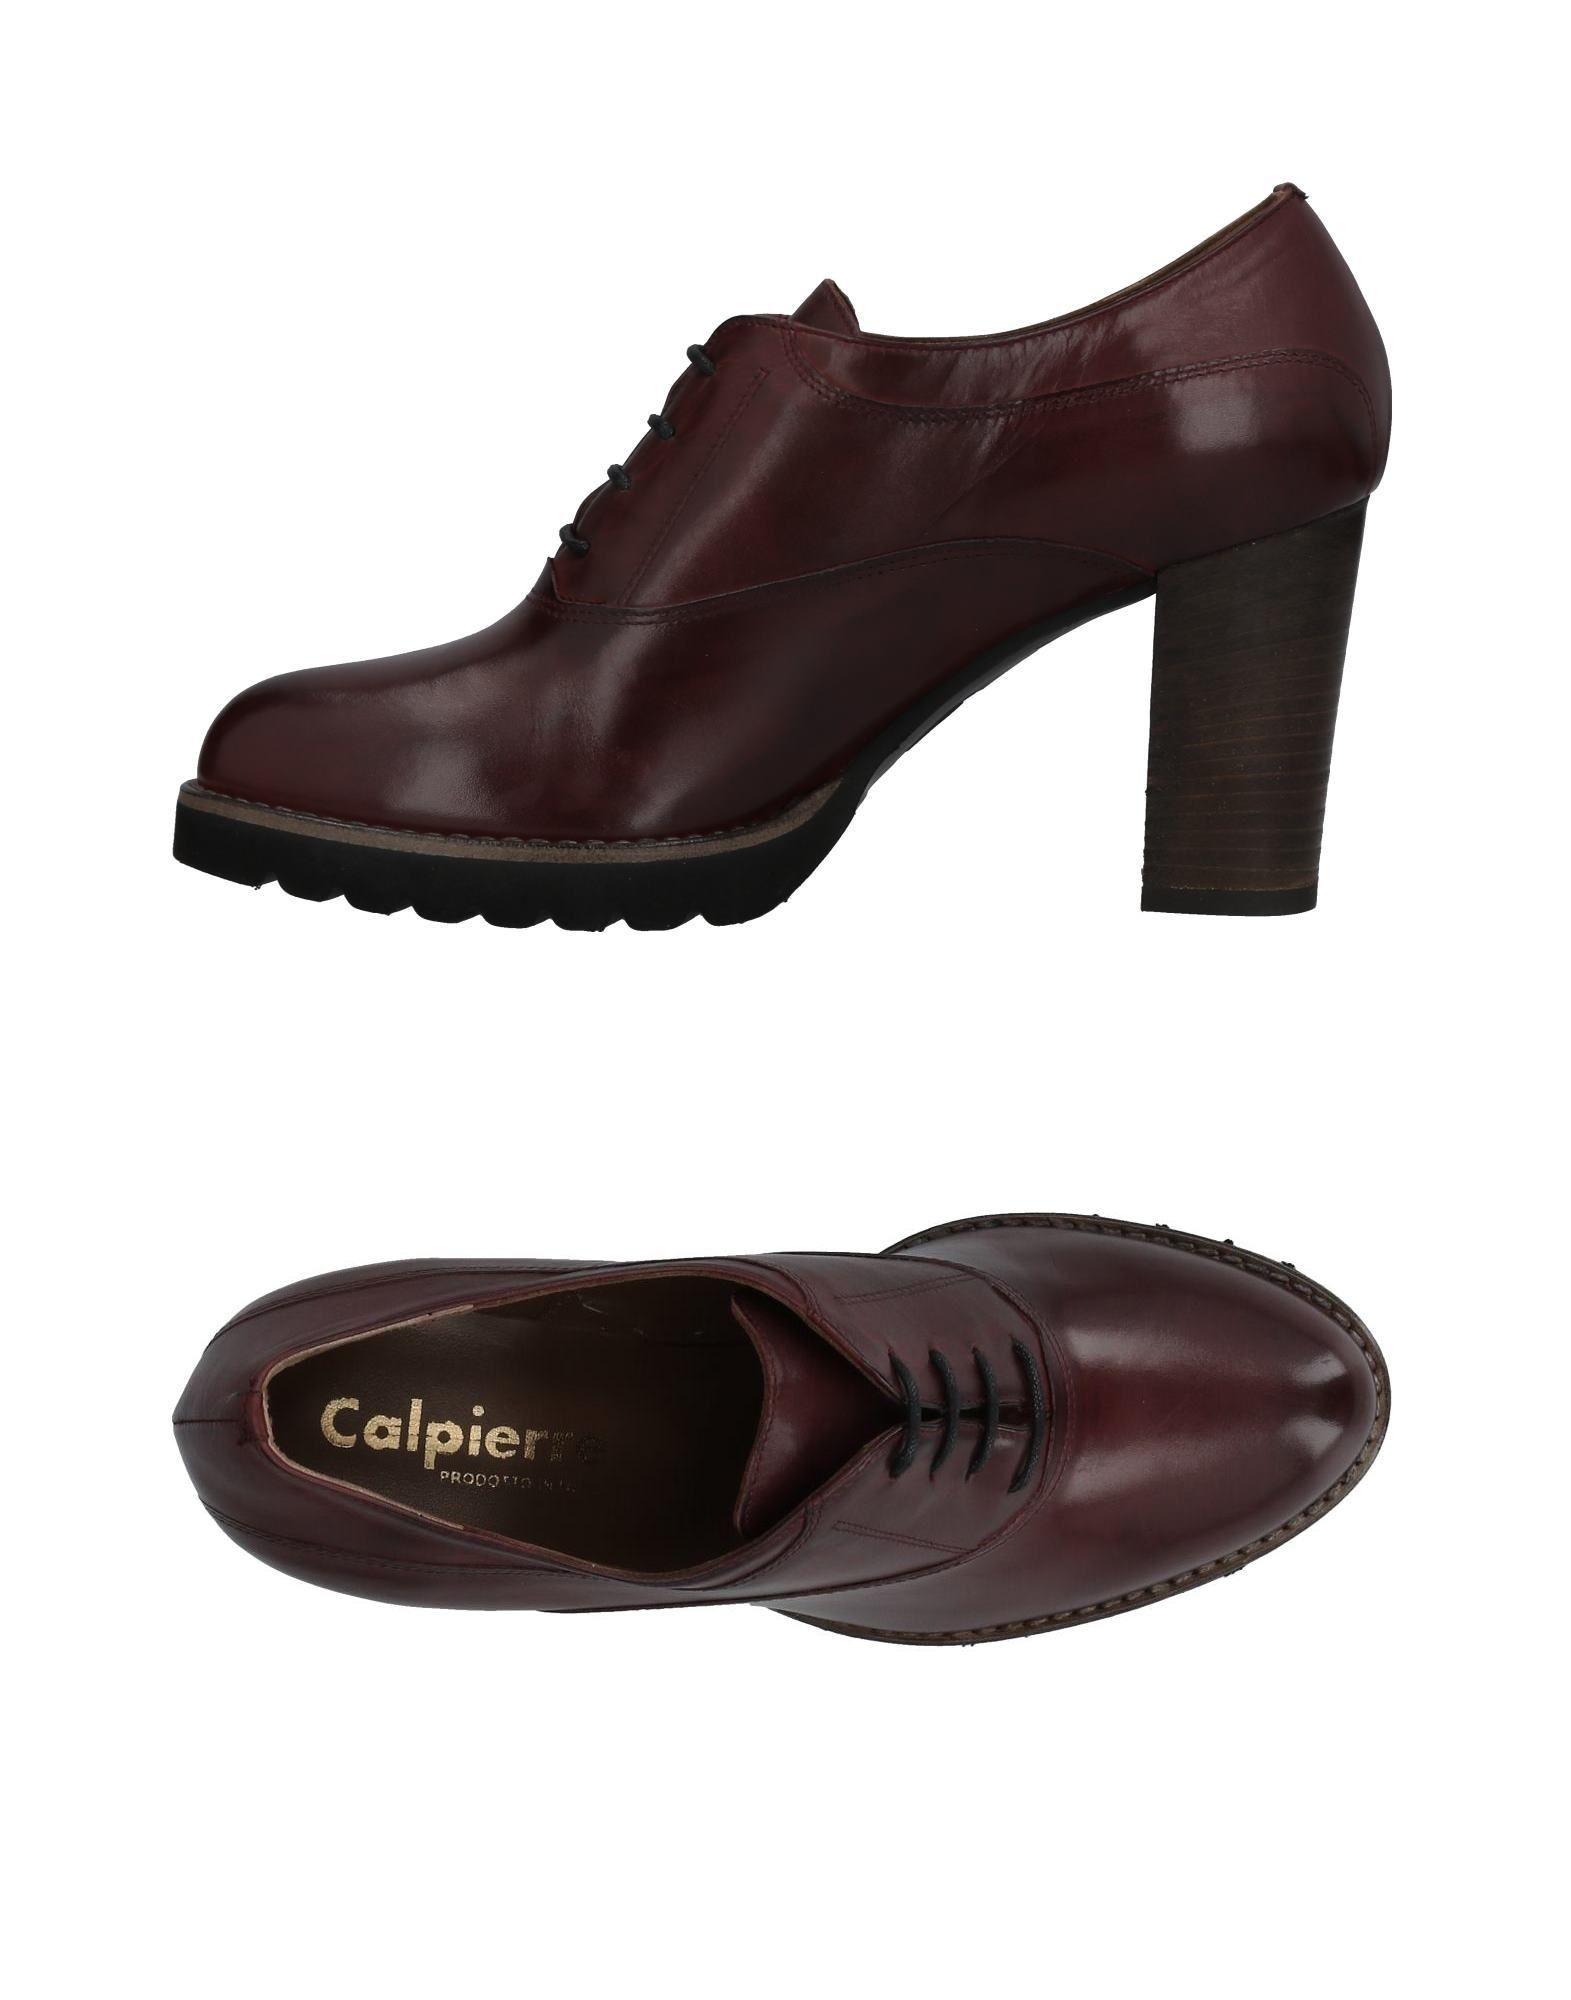 Stringate Calpierre Donna - Acquista online su